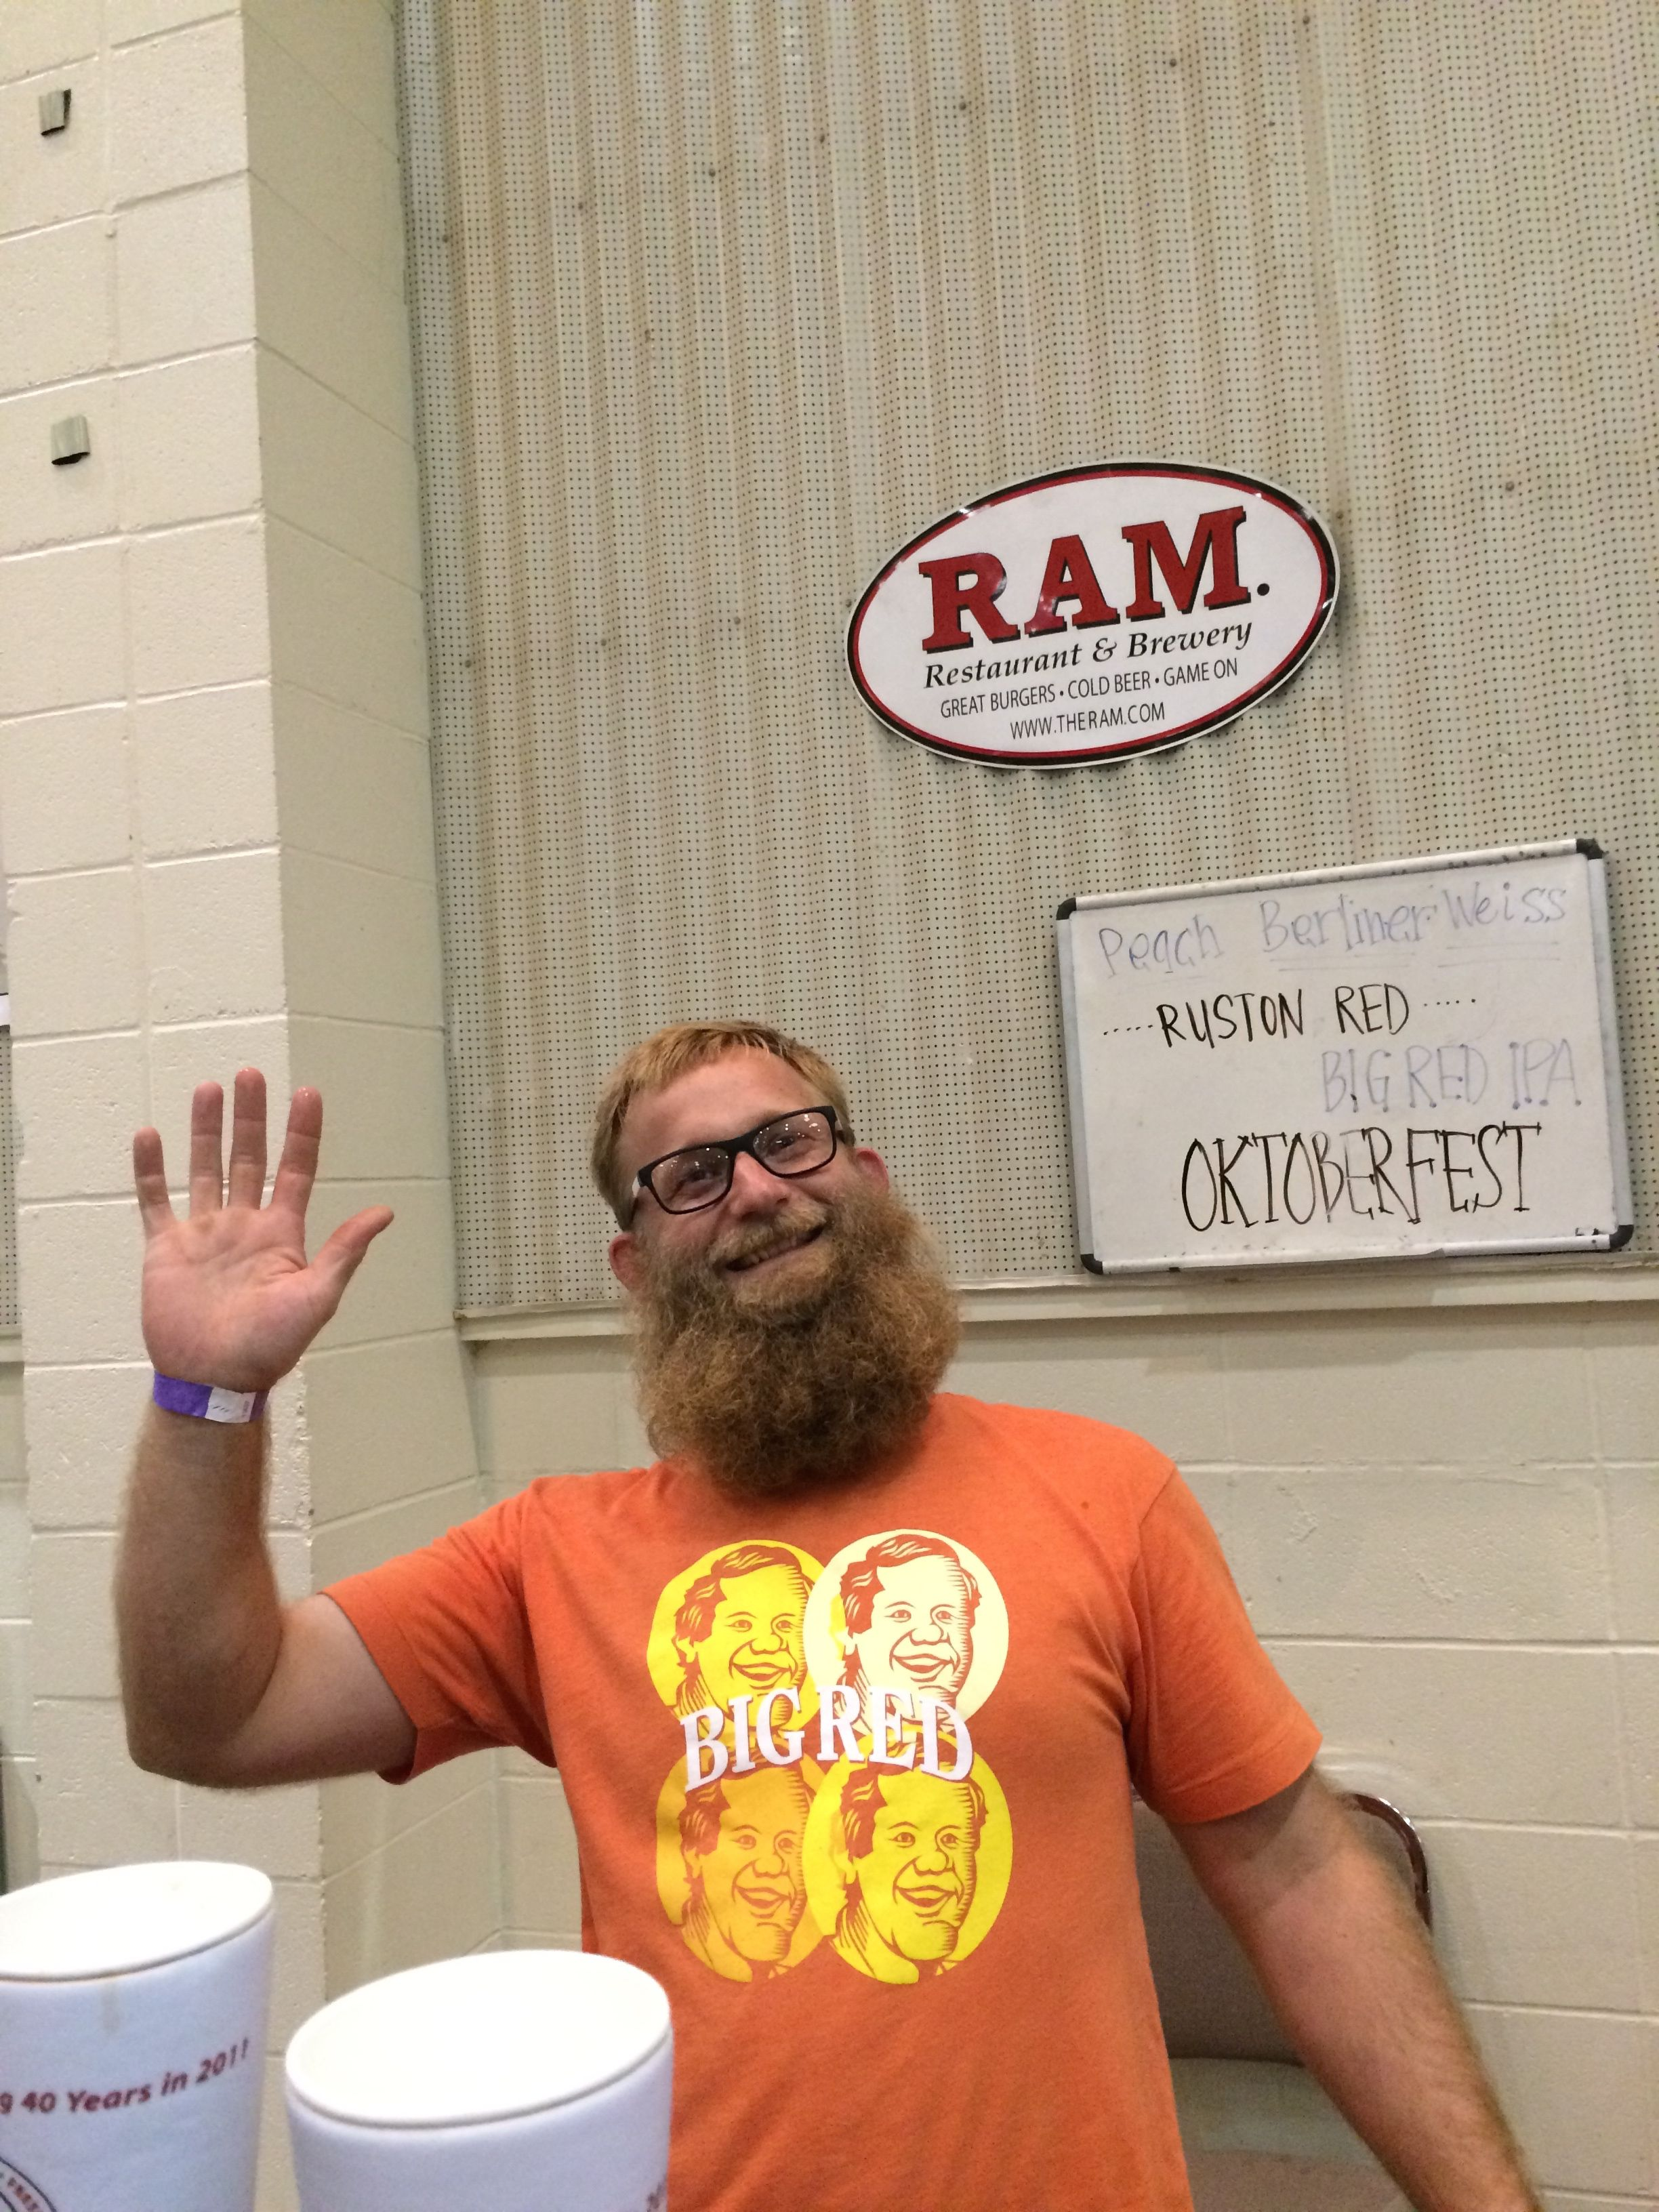 RAM Restaurant & Brewery, Tacoma, Washington